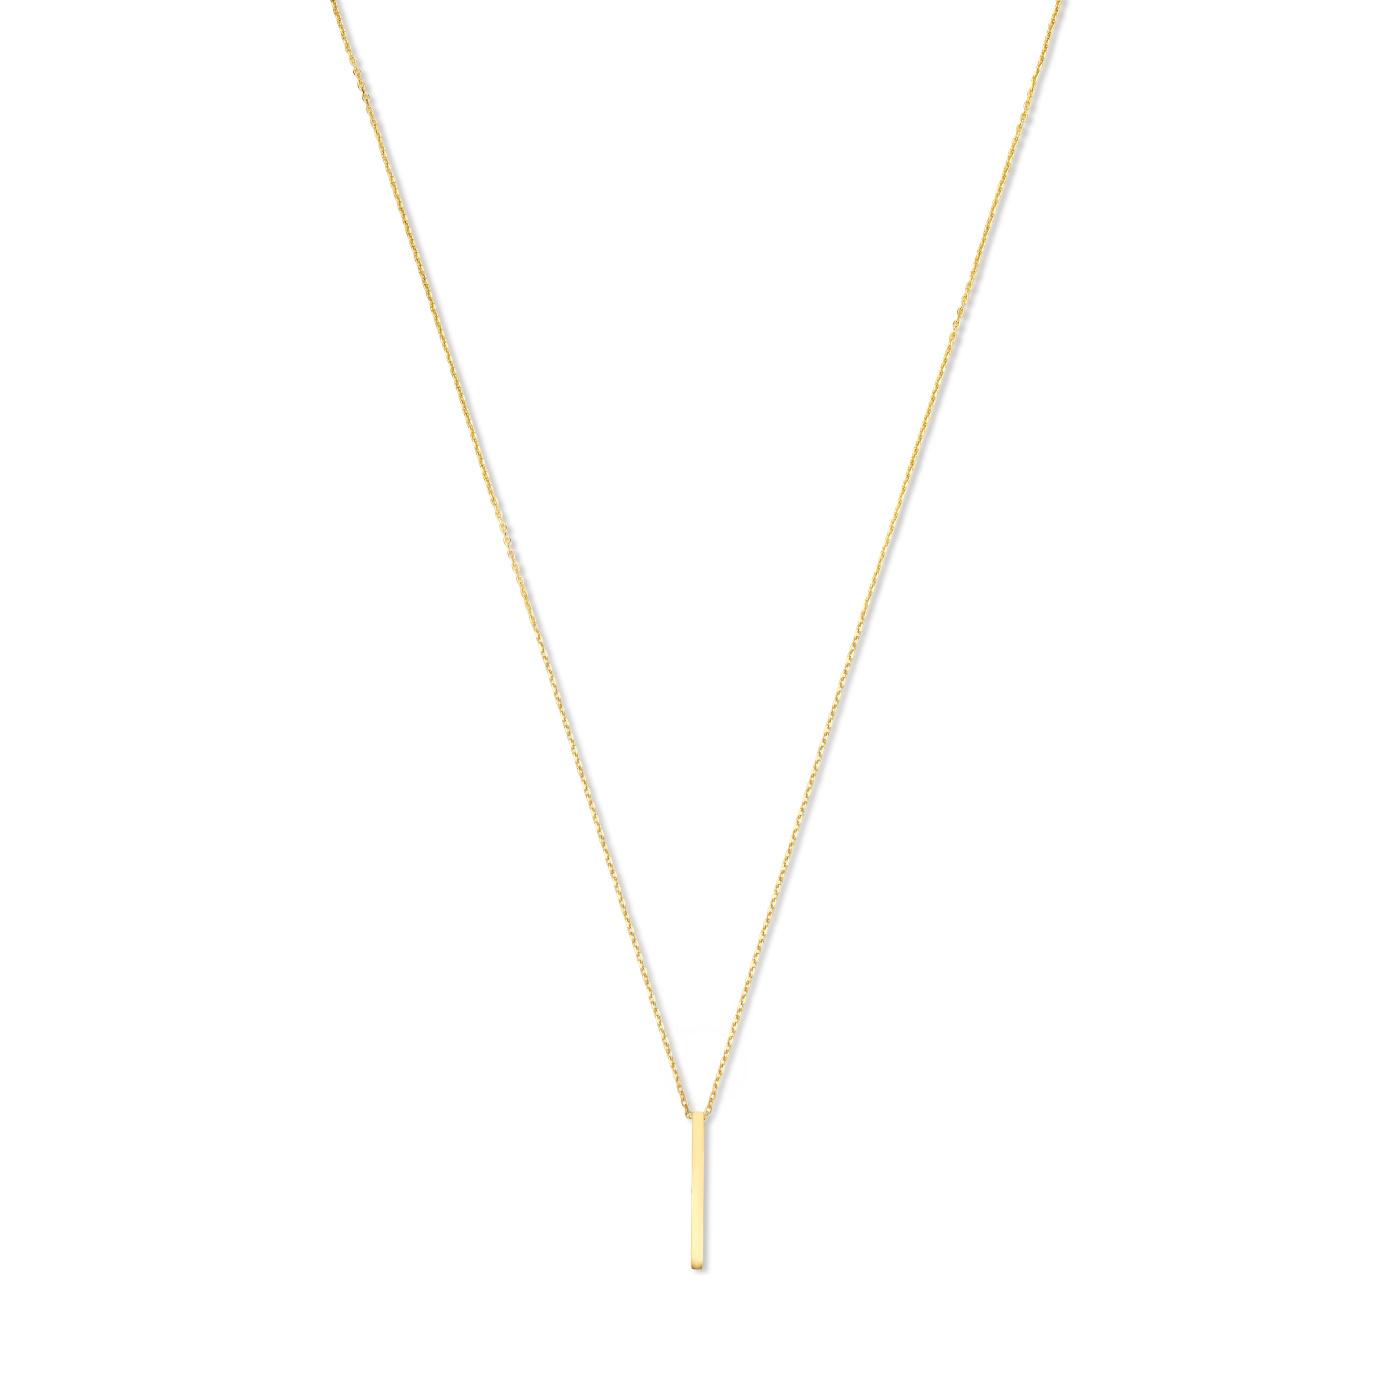 Isabel Bernard Le Marais Eloise collana in oro 14 carati